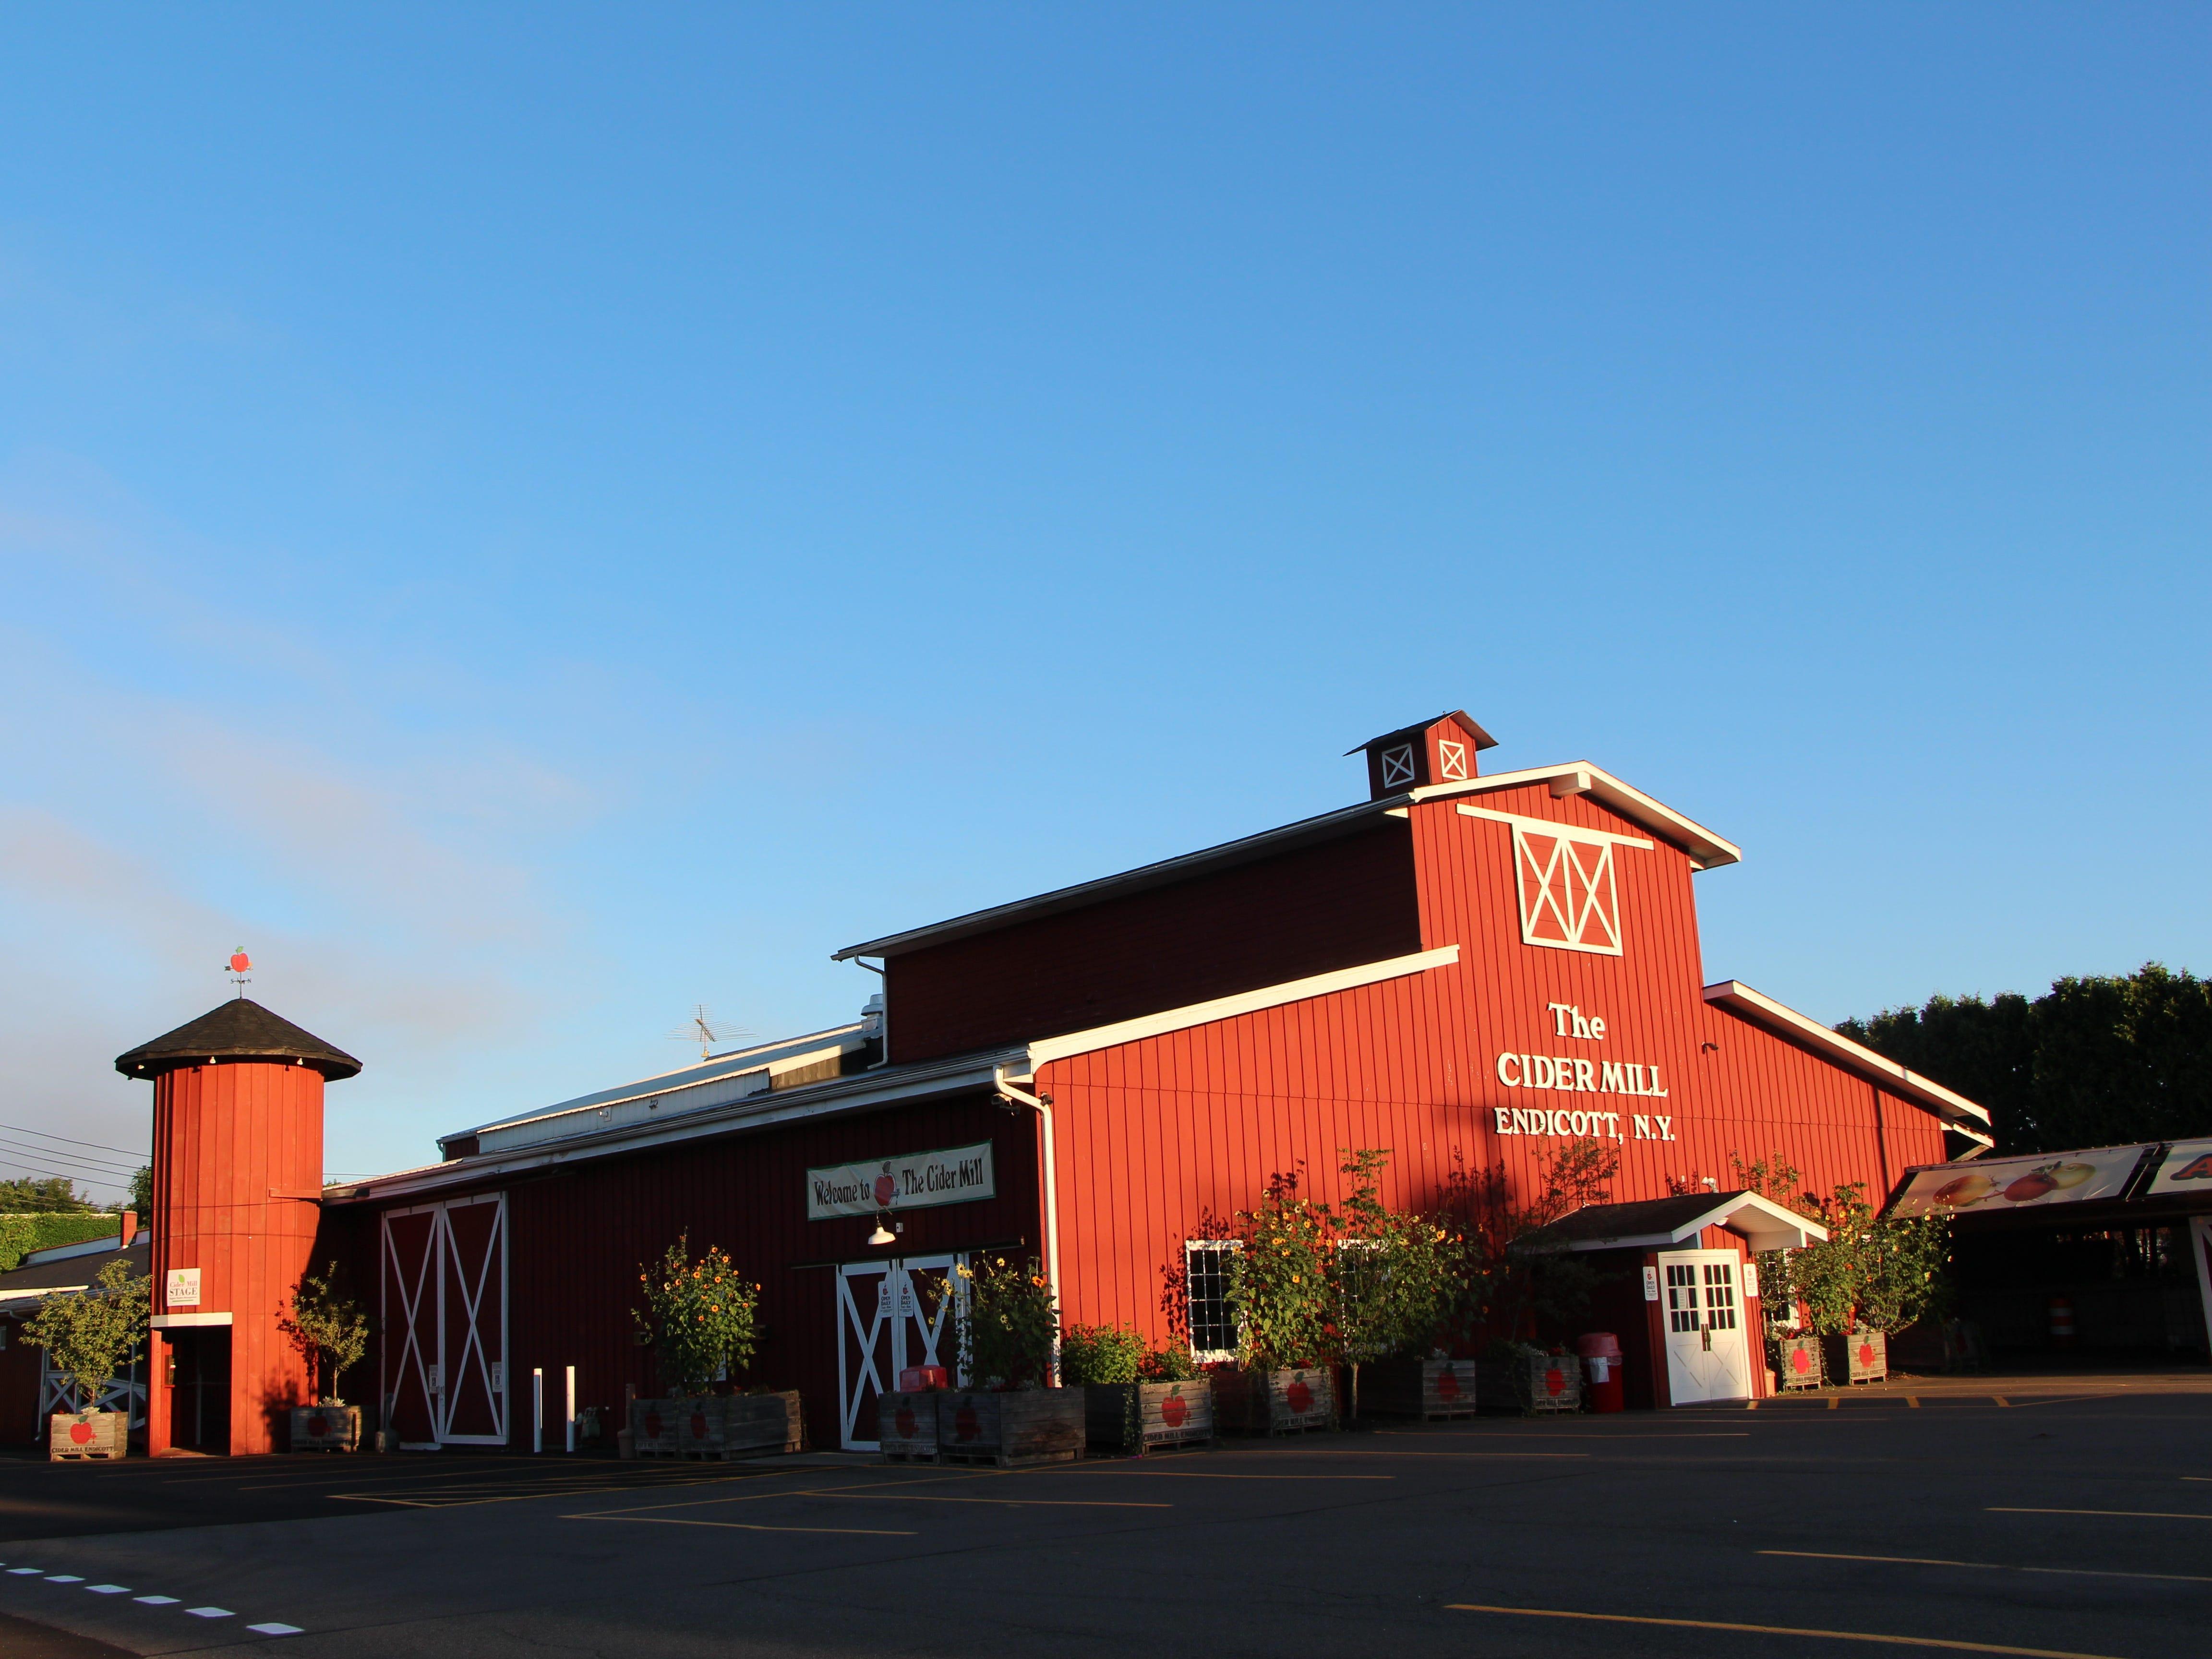 Cider Mill in Endicott.